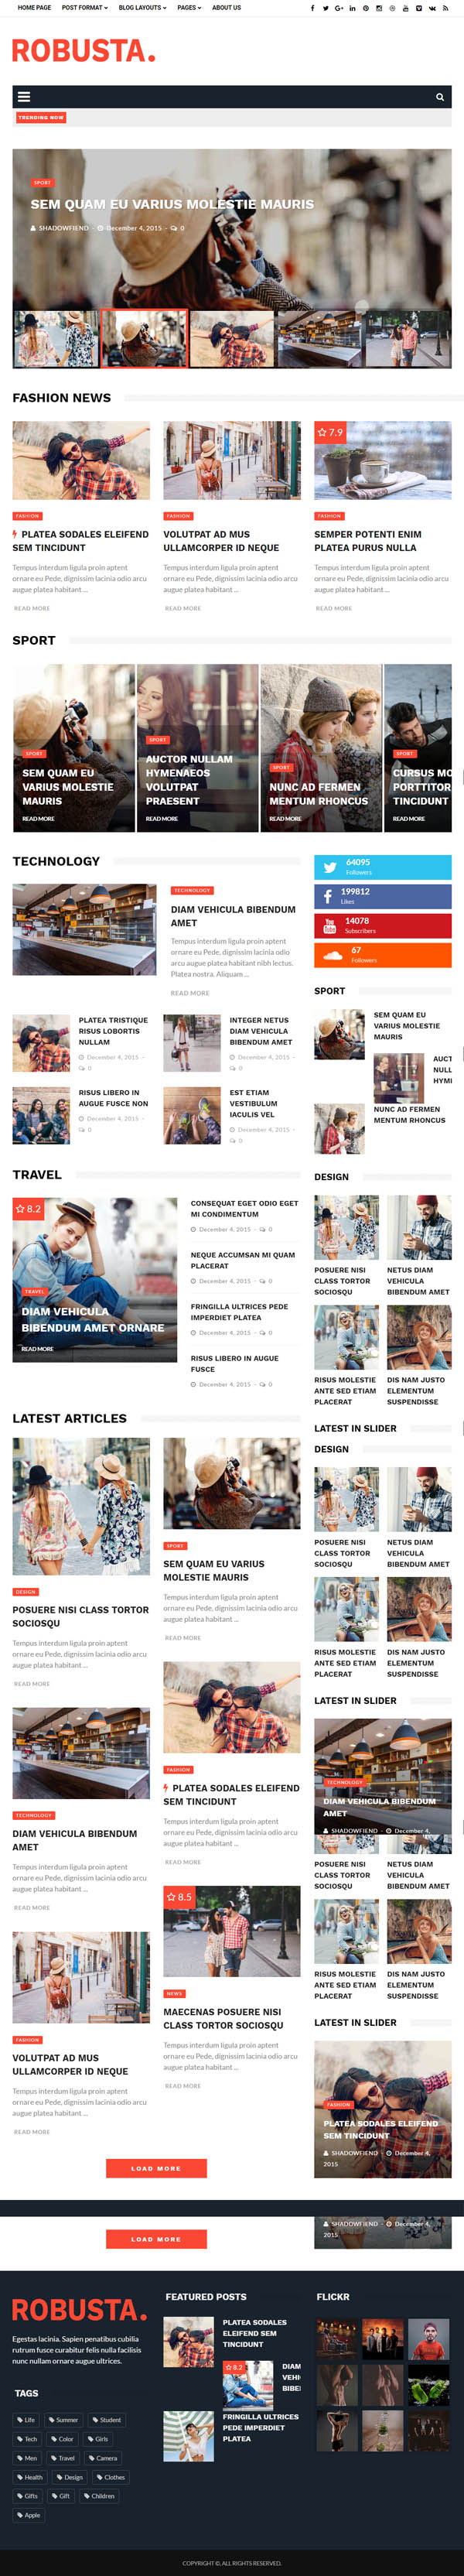 Robusta - Responsive WordPress Magazine and Blog Theme